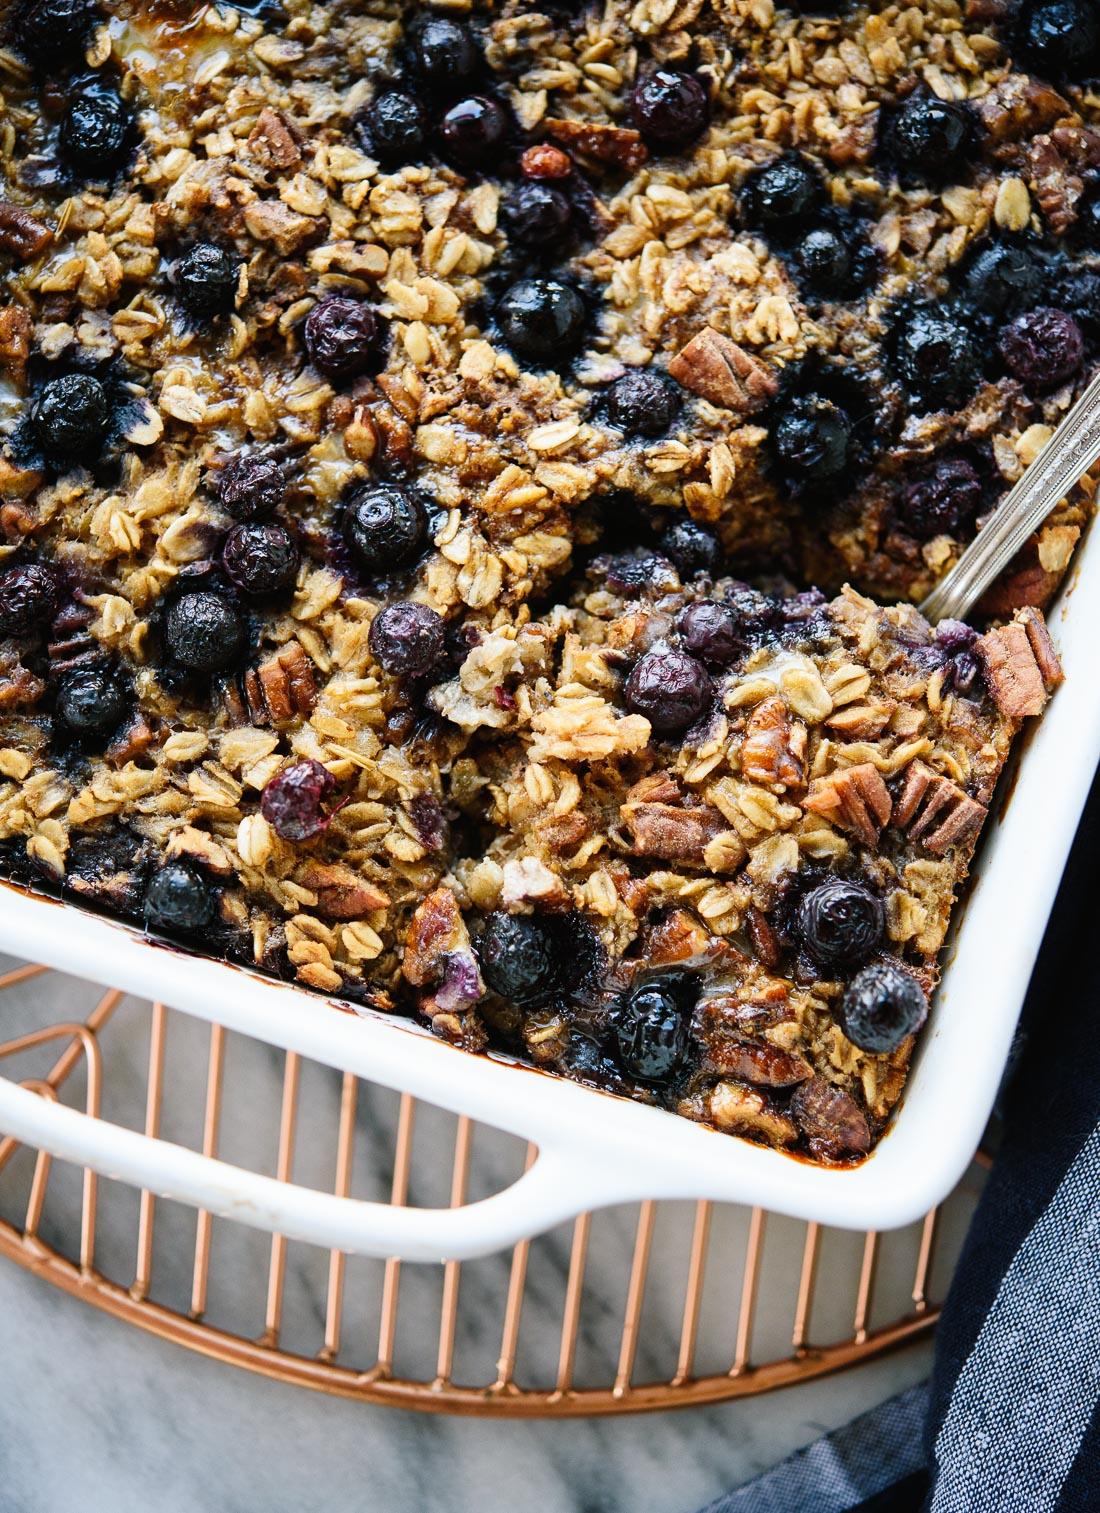 blueberry-baked-oatmeal-1